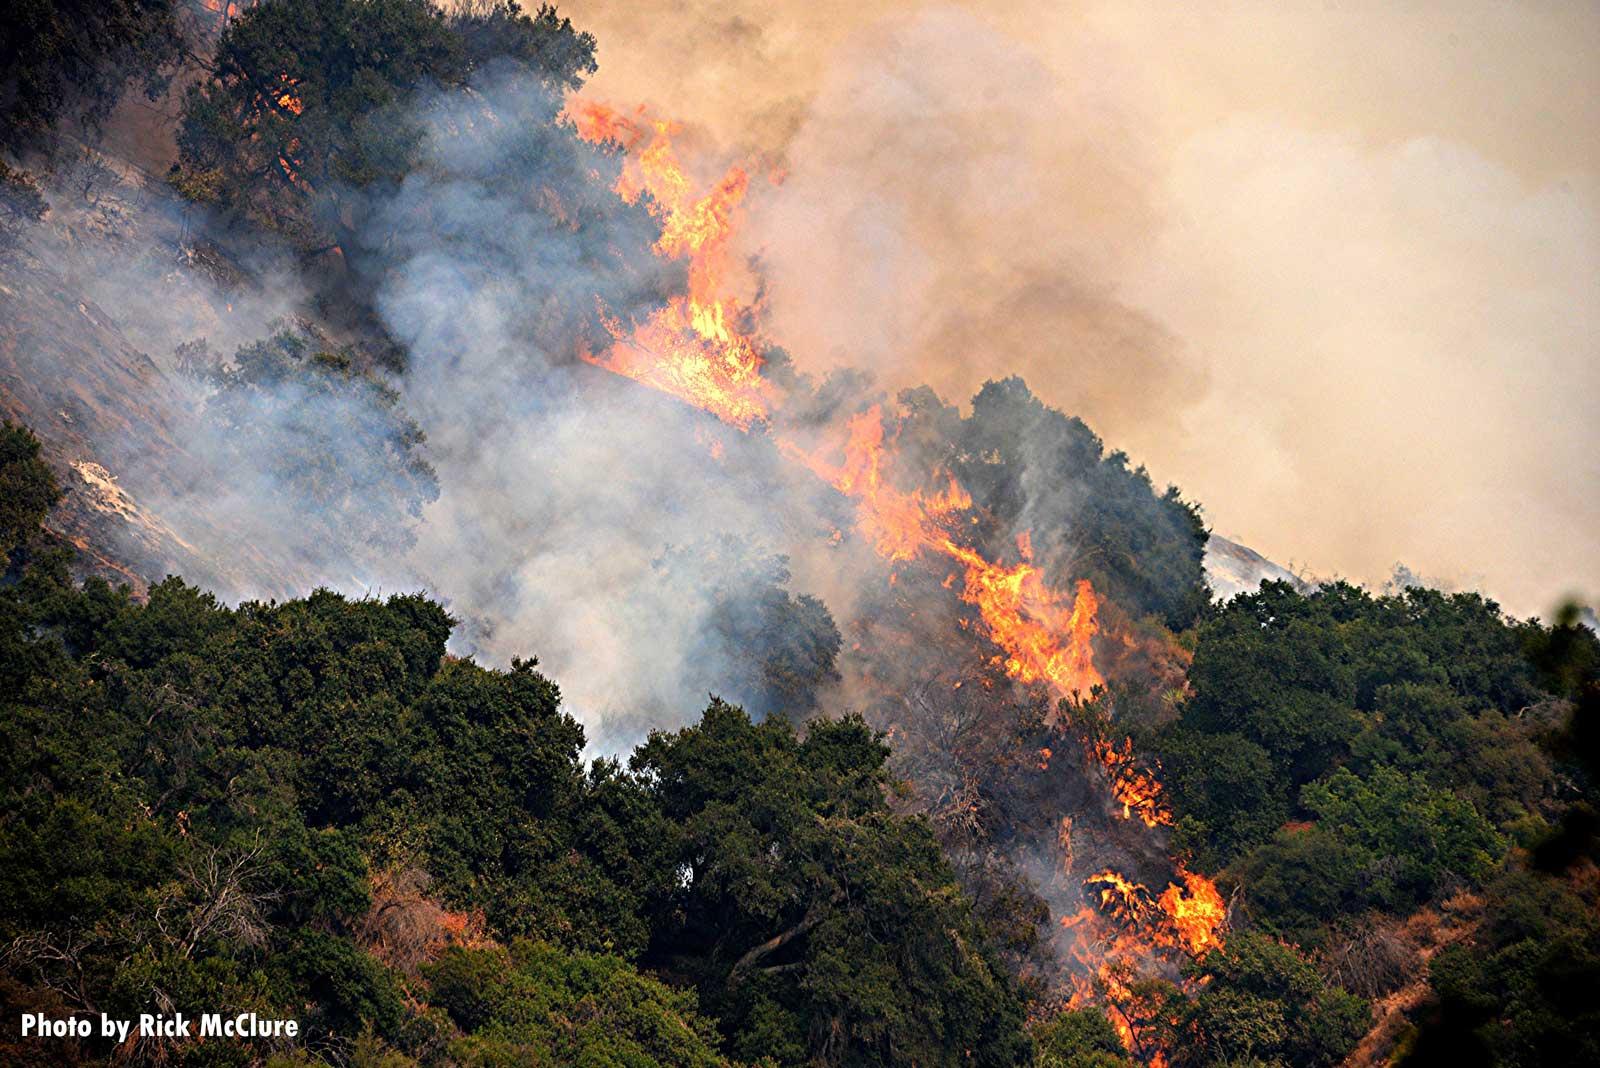 Flames roaring through vegetation during the Bobcat Fire